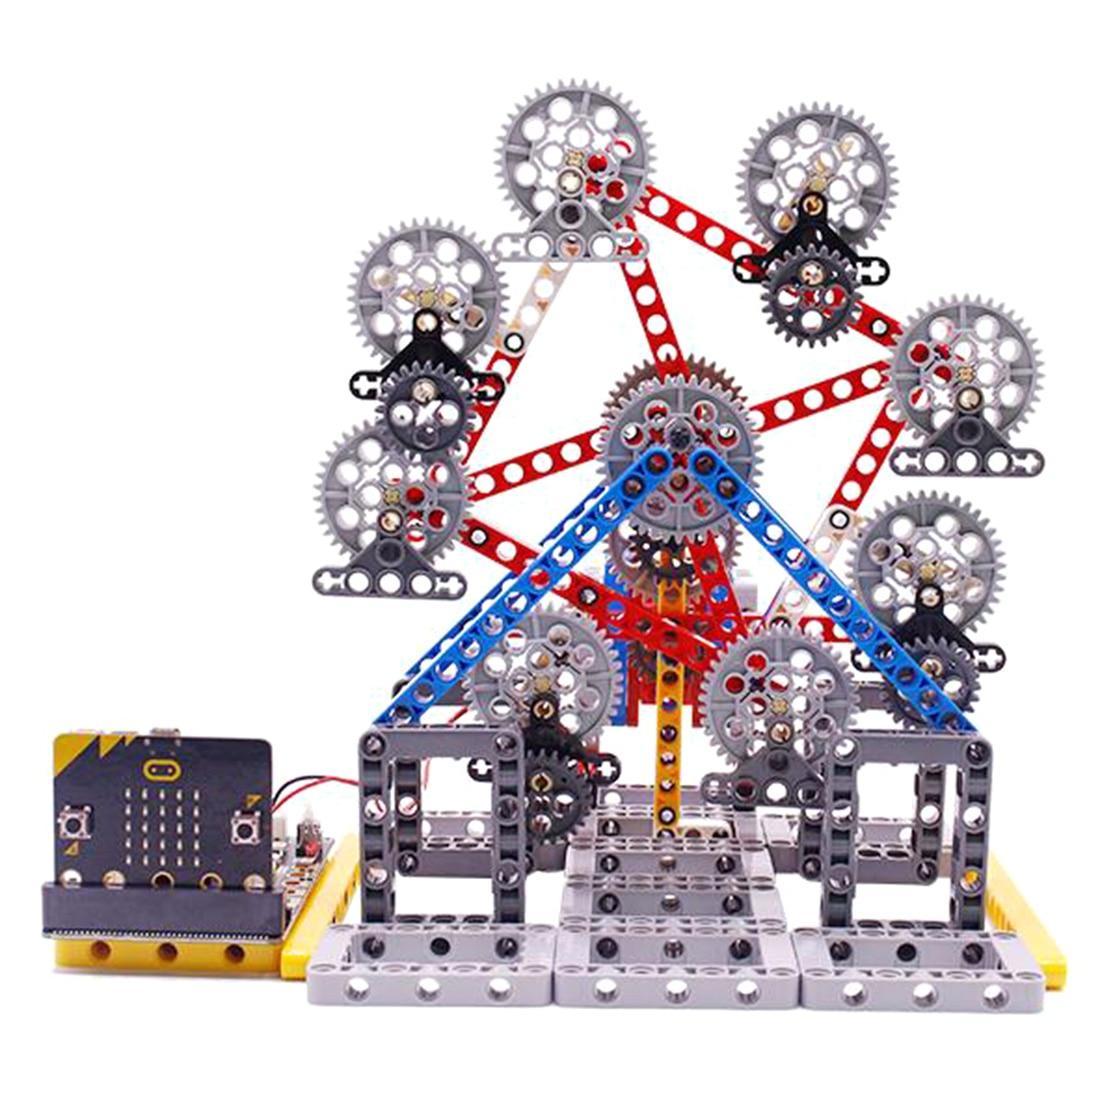 Micro:Bit Programmable Building Block DIY Smart Ferris Wheel Kit Brain-Training Toy For Children Educational Toys Birthday Gift